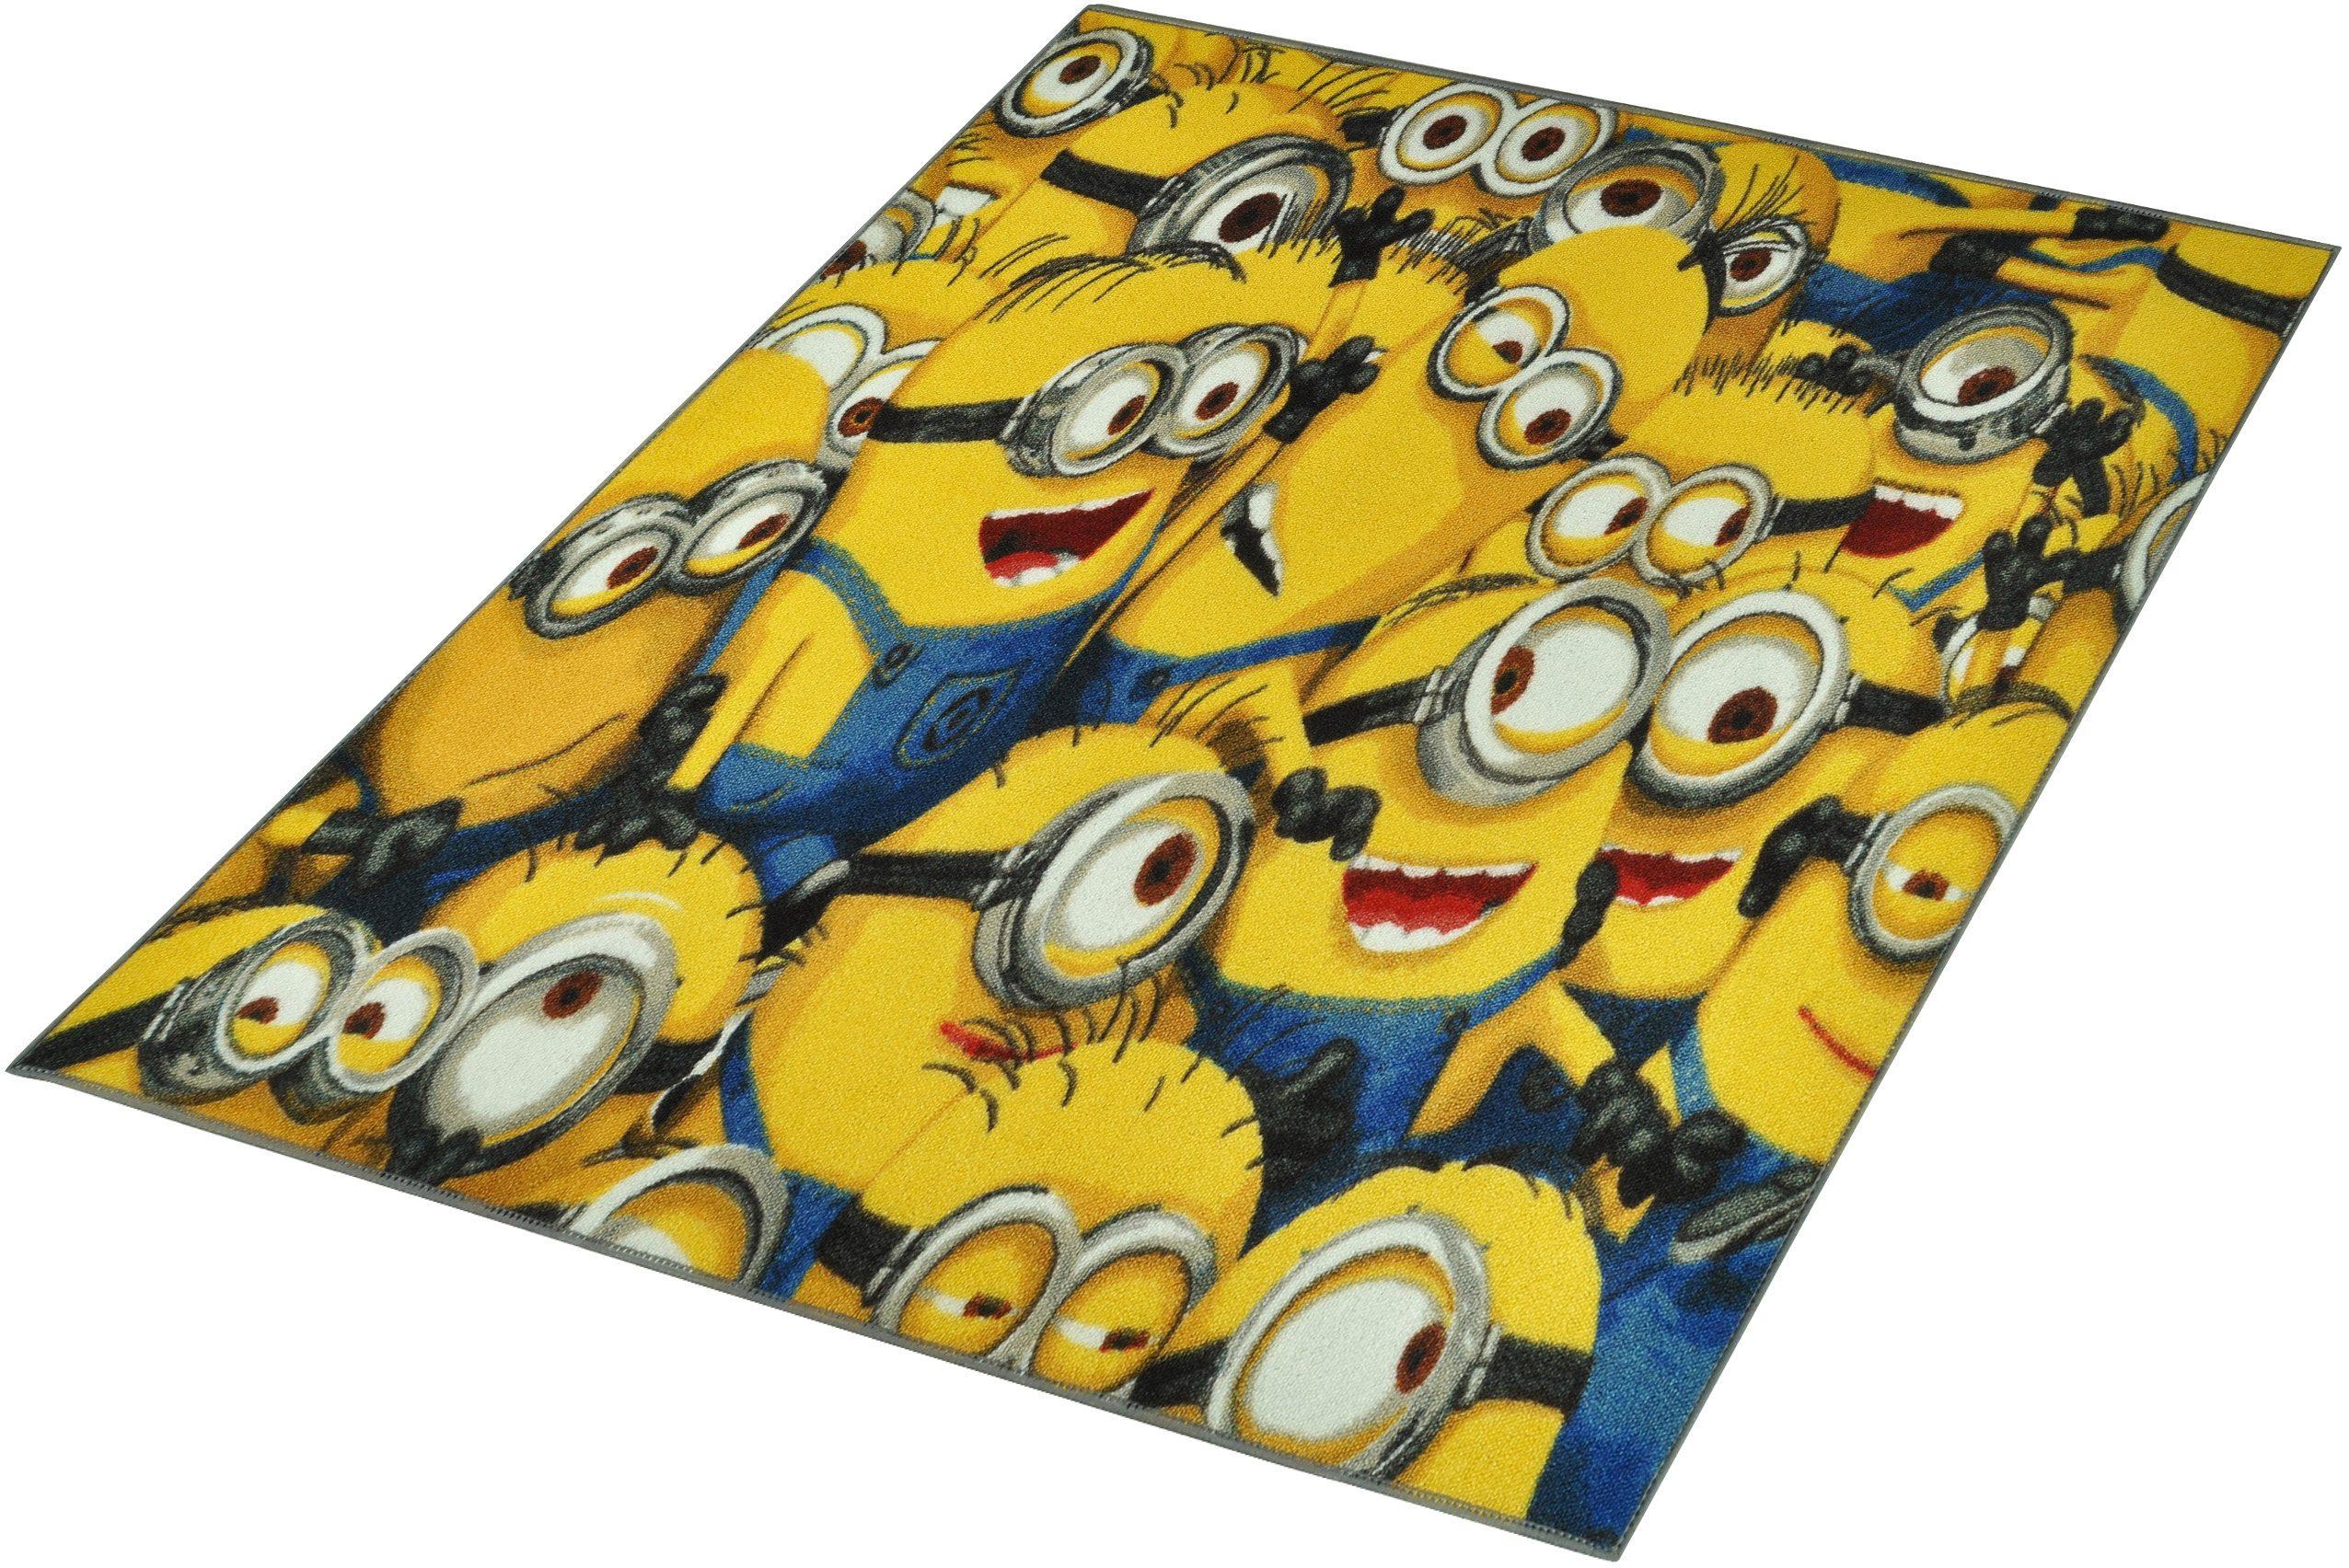 Kinder-Teppich, Minions Lizenz Teppich »Minions«, getuftet